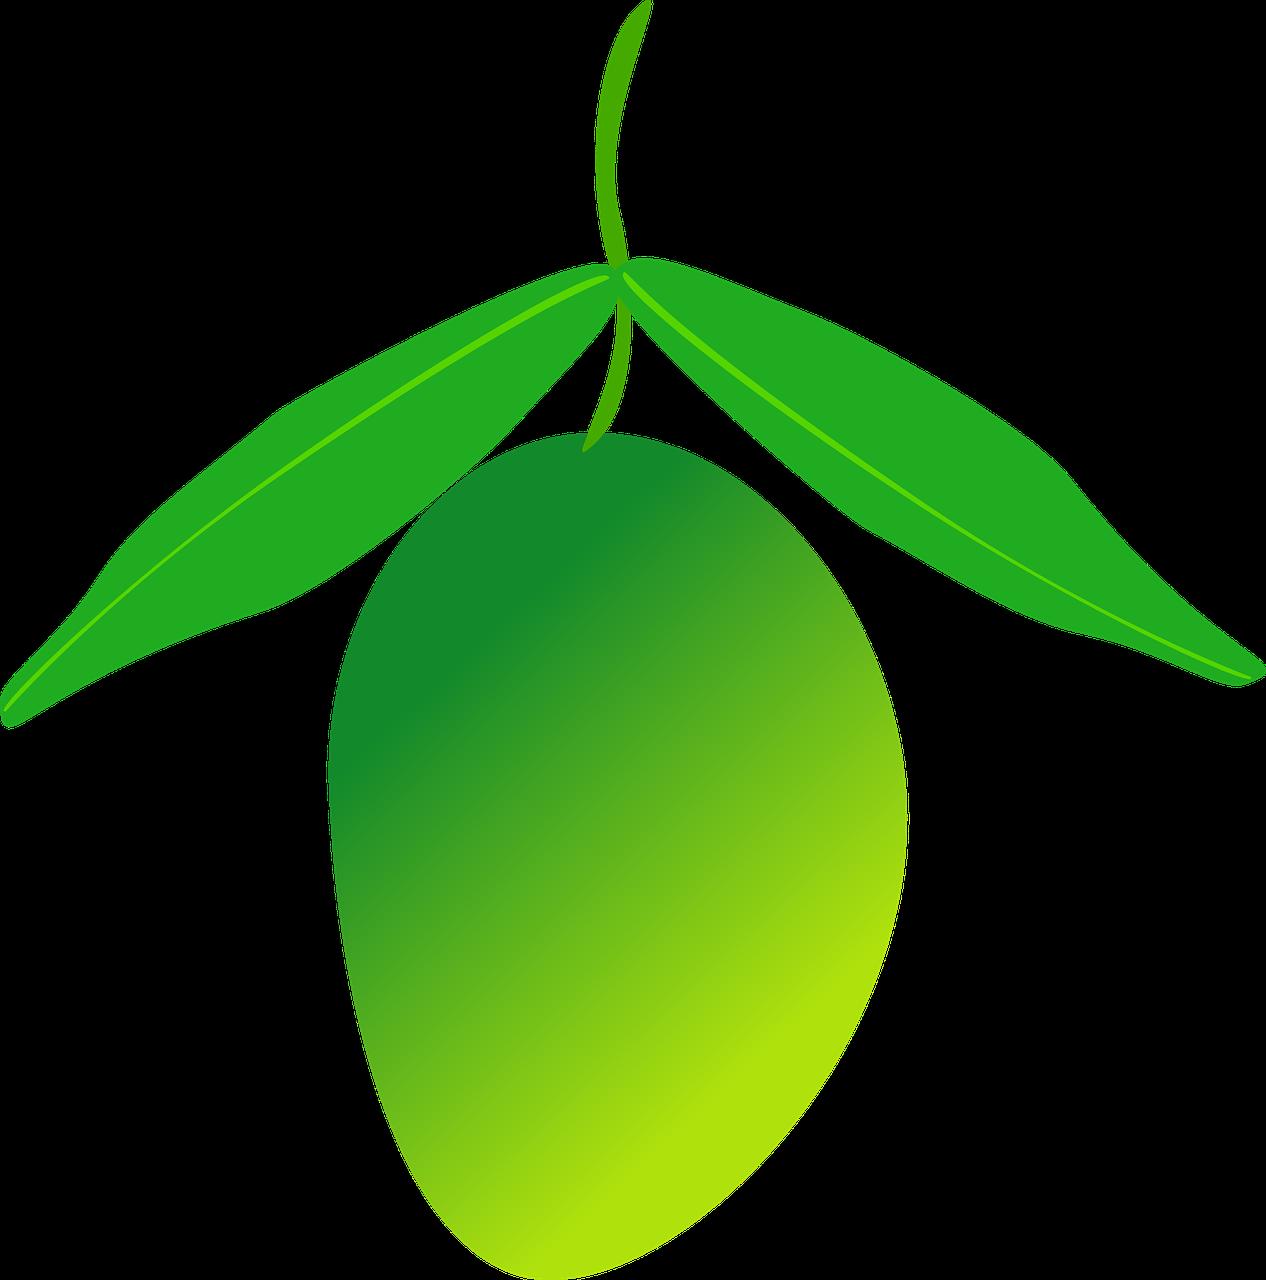 Fruit green transprent png. Mango clipart unripe mango